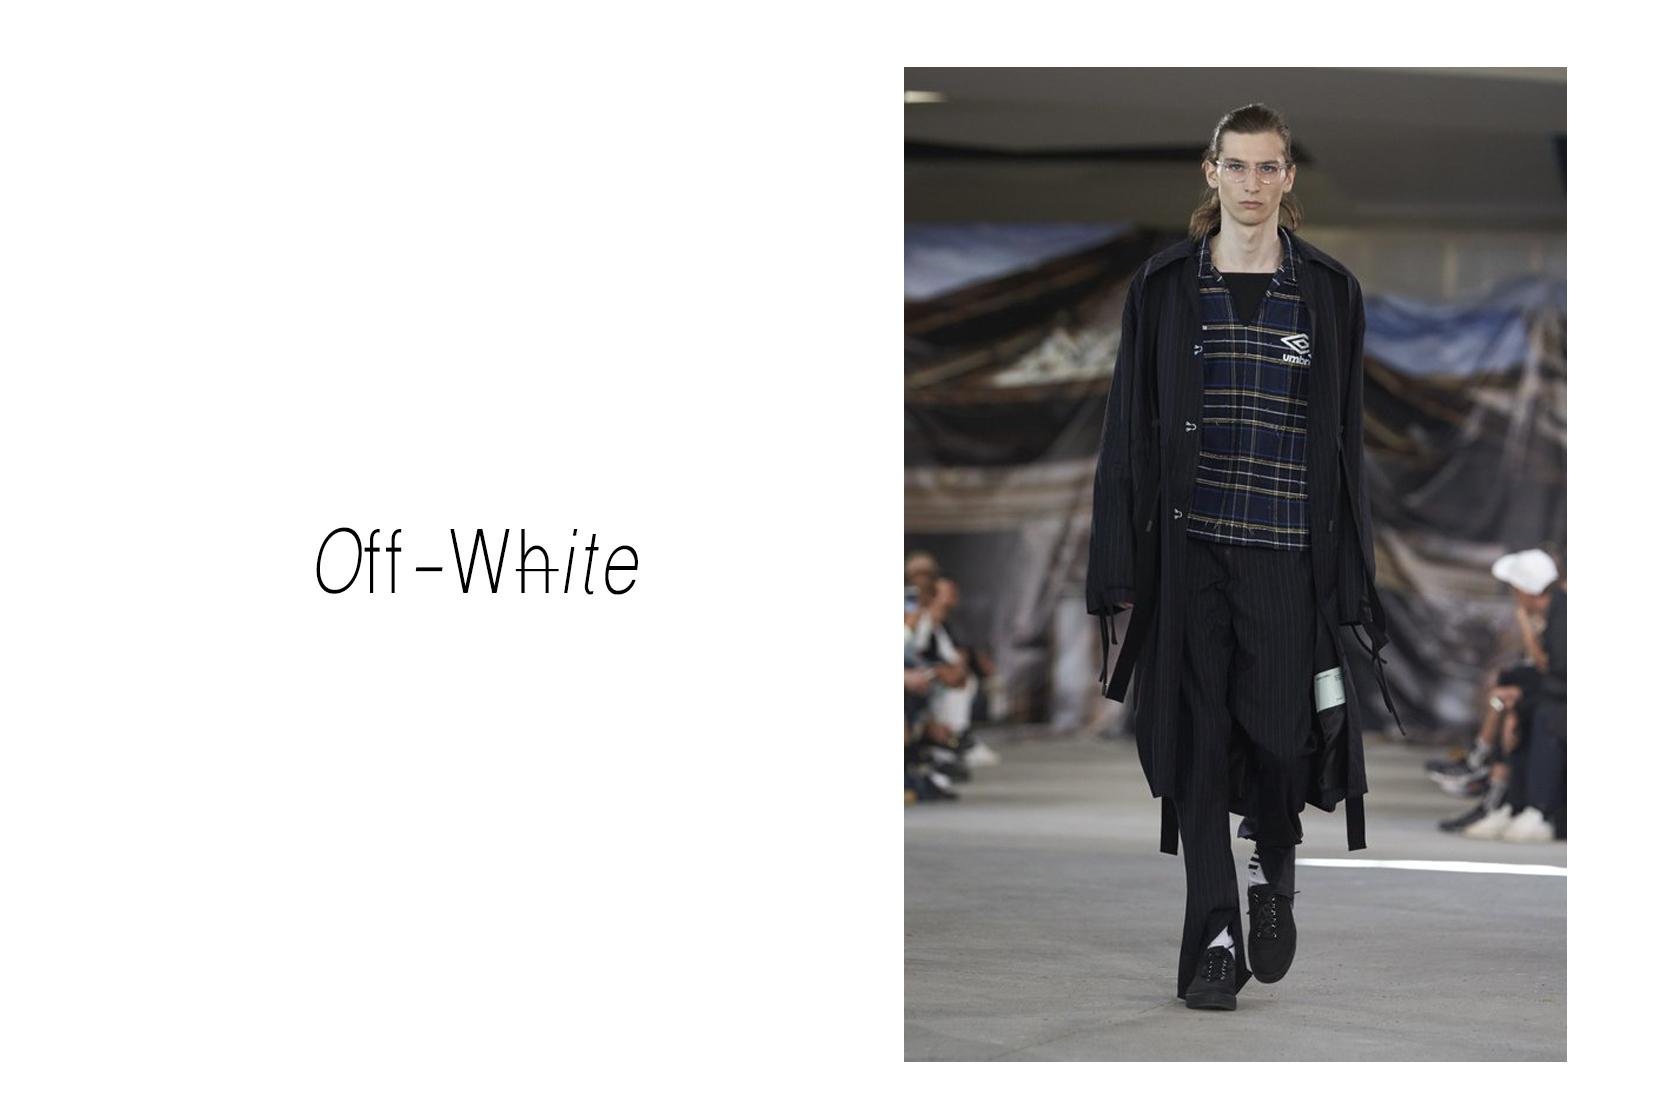 off-white 1